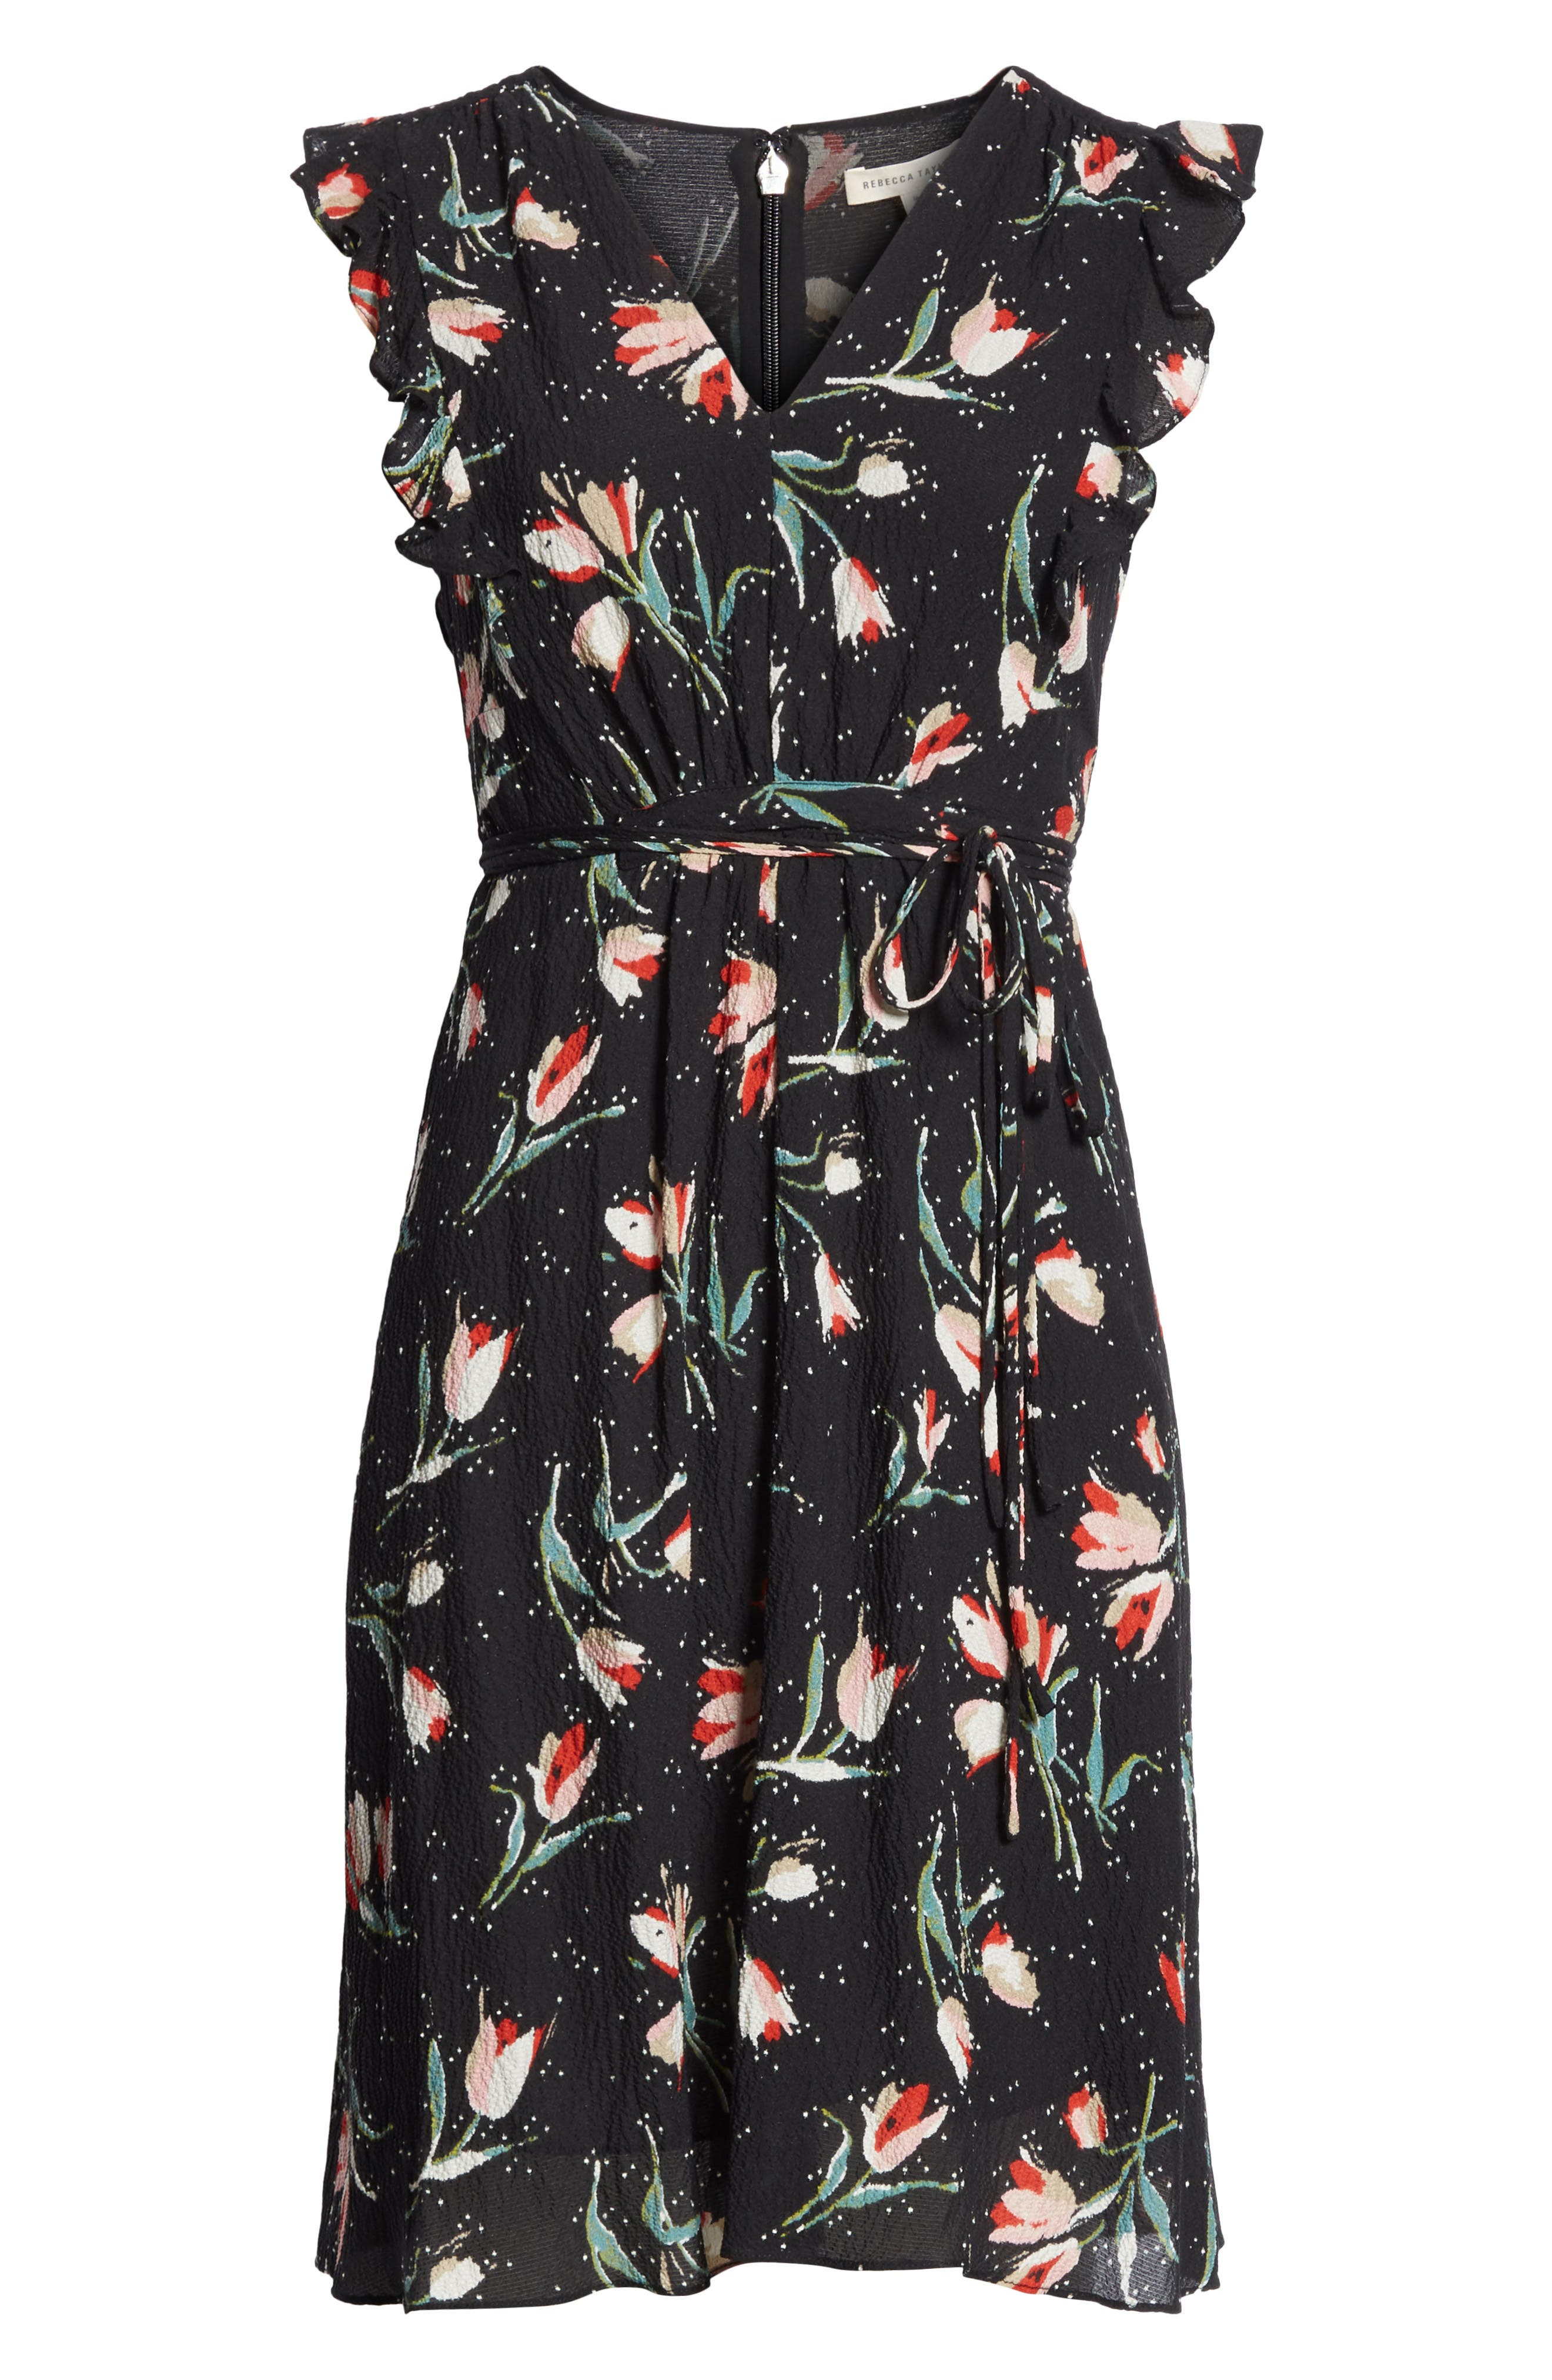 Ruffled Ikat Floral A-Line Dress,                             Alternate thumbnail 6, color,